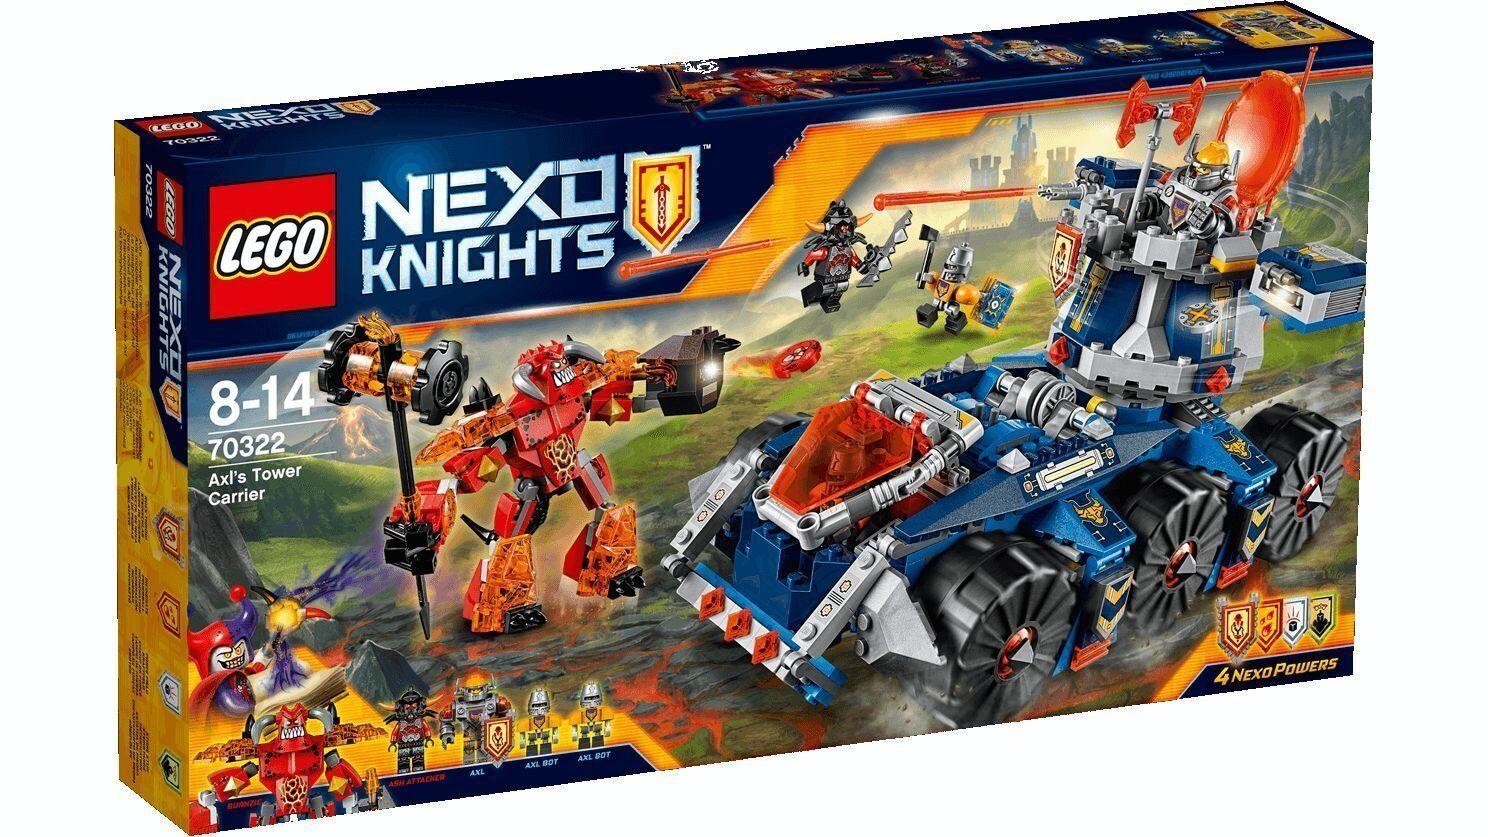 Set LEGO NEXO KNIGHTS réf  70322 - Axl's Tower Carrier - NEUF scellé